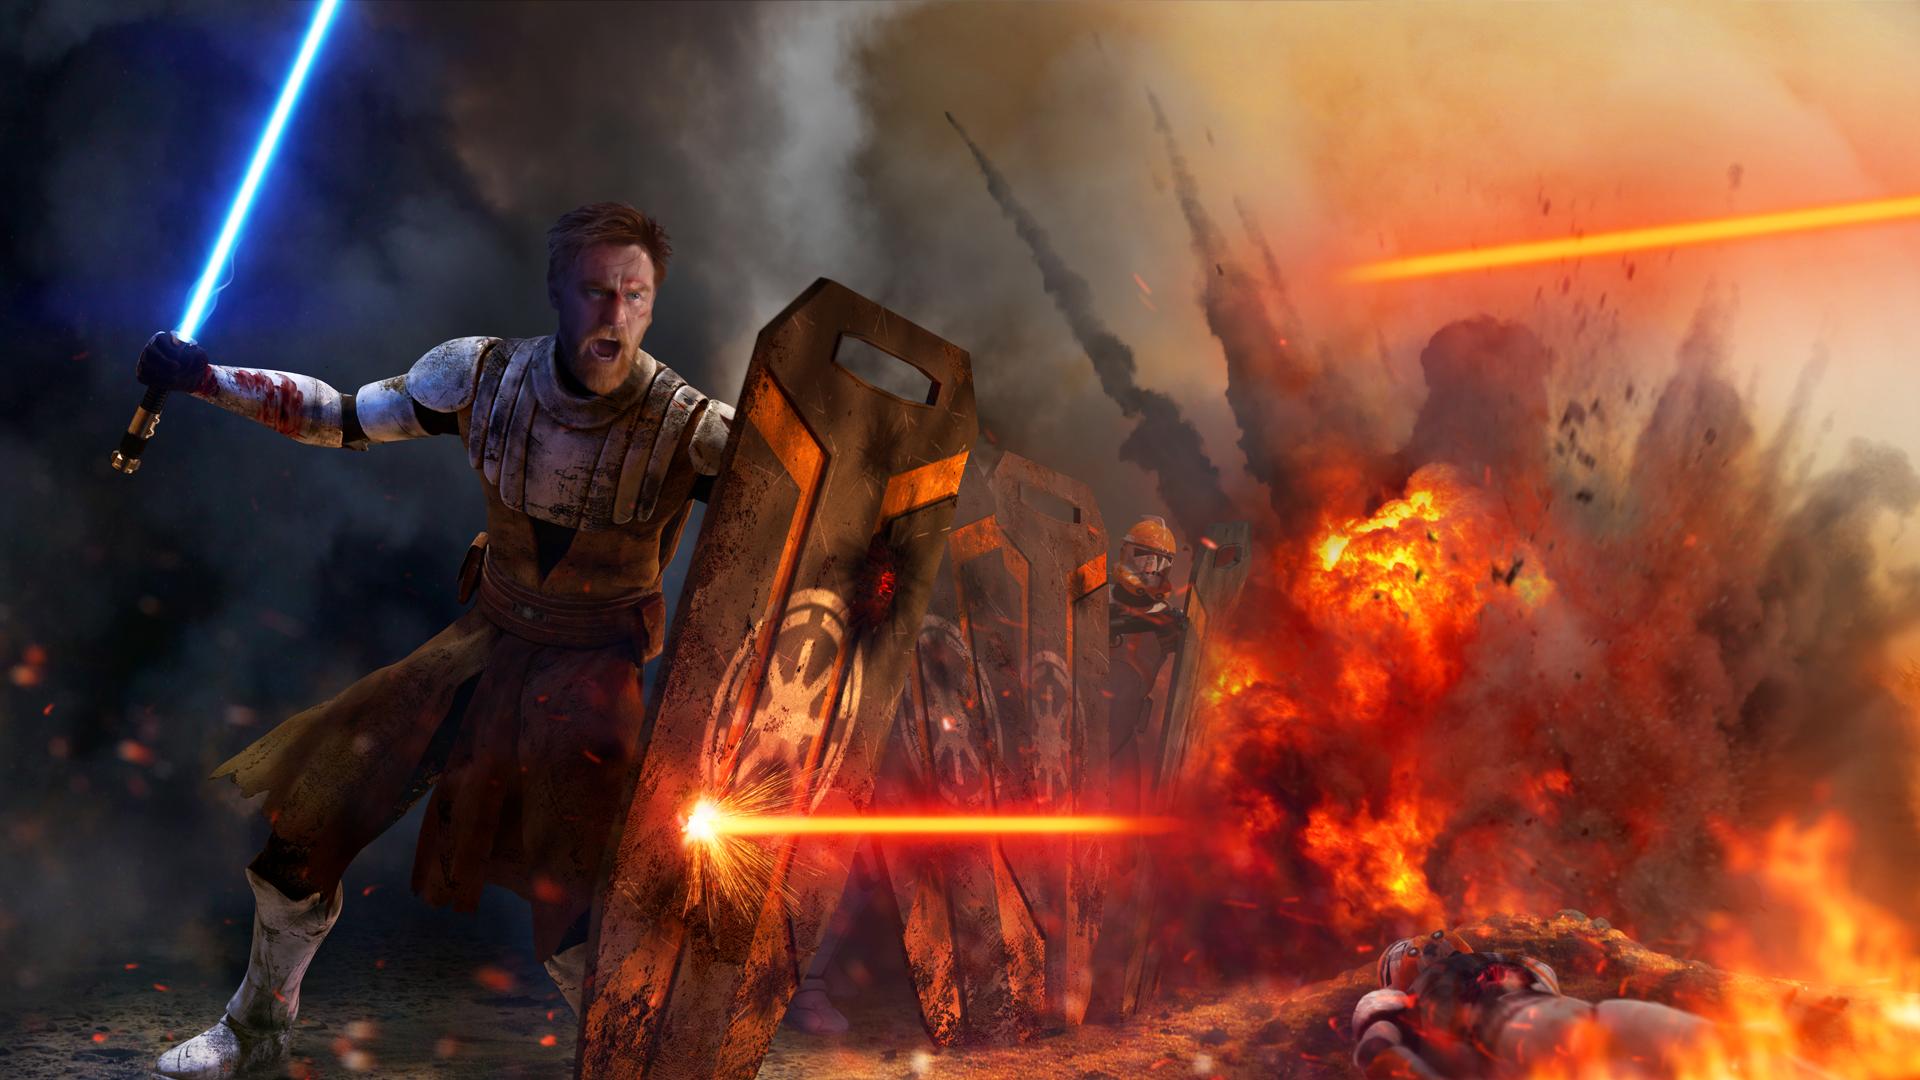 Star Wars Peacekeeper Obi Wan Kenobi By Thetechromancer